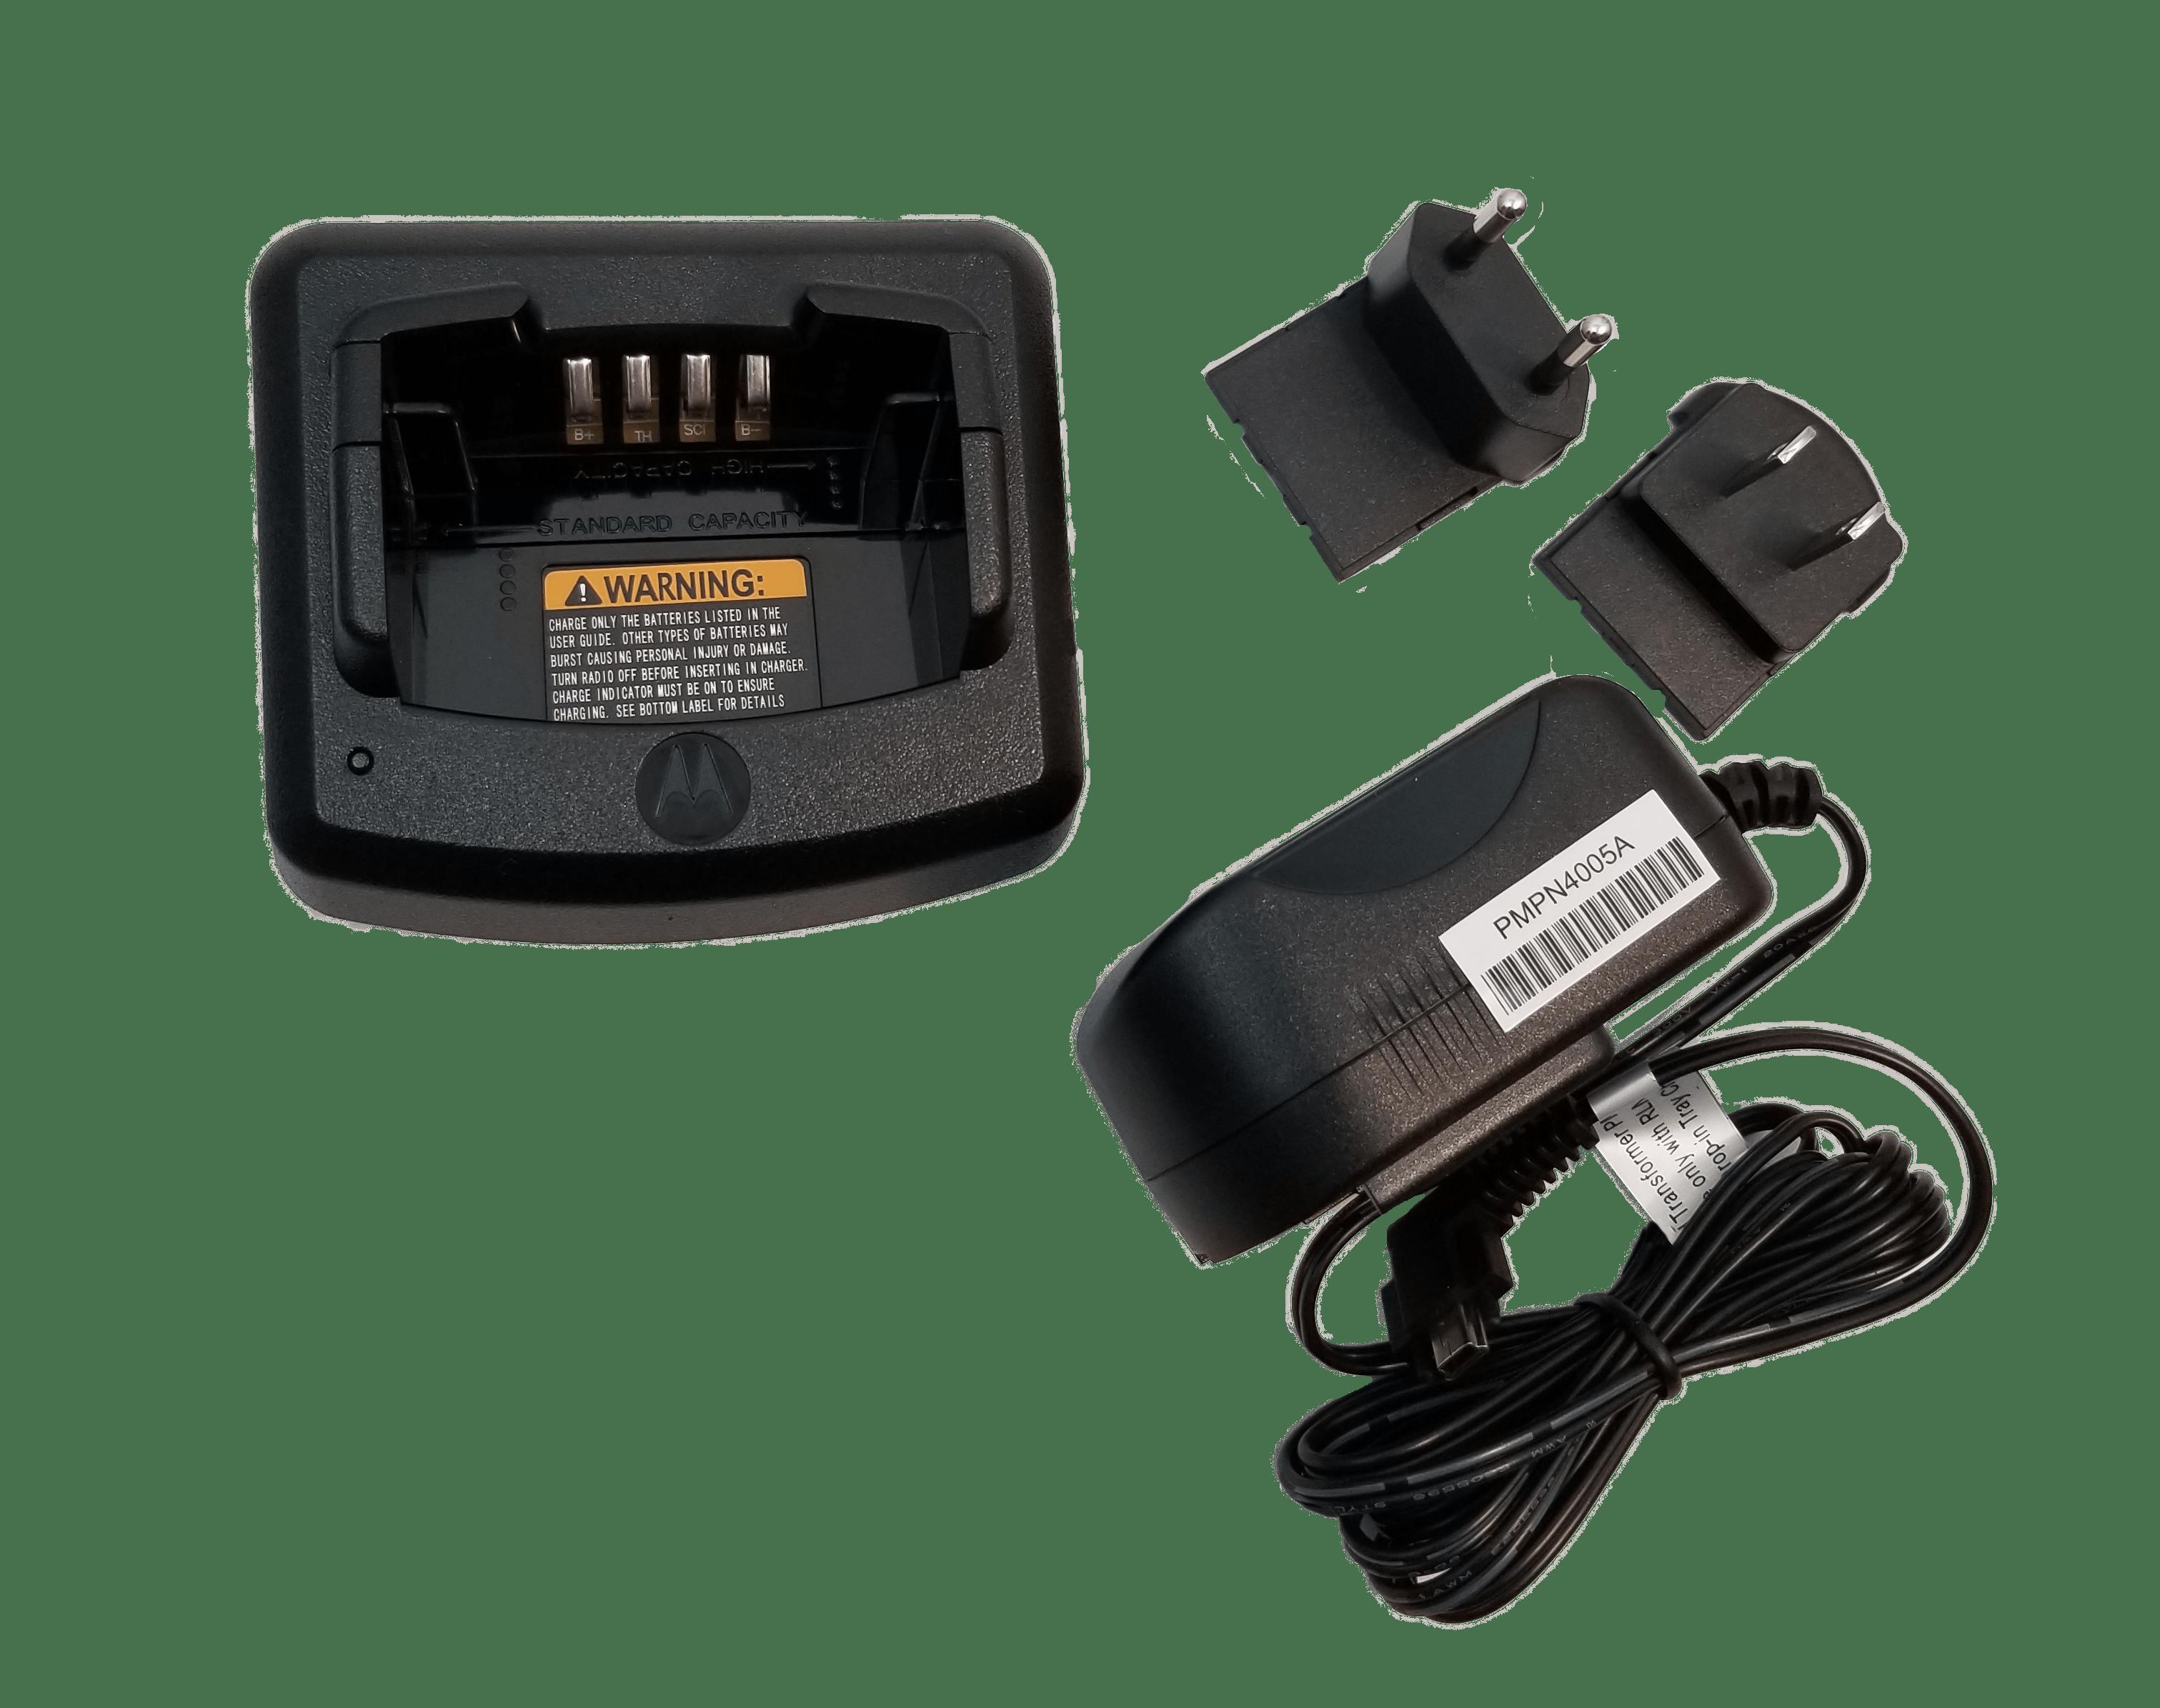 RLN6304 - Motorola 2 Hour Rapid Charging Kit For Rdx Radios